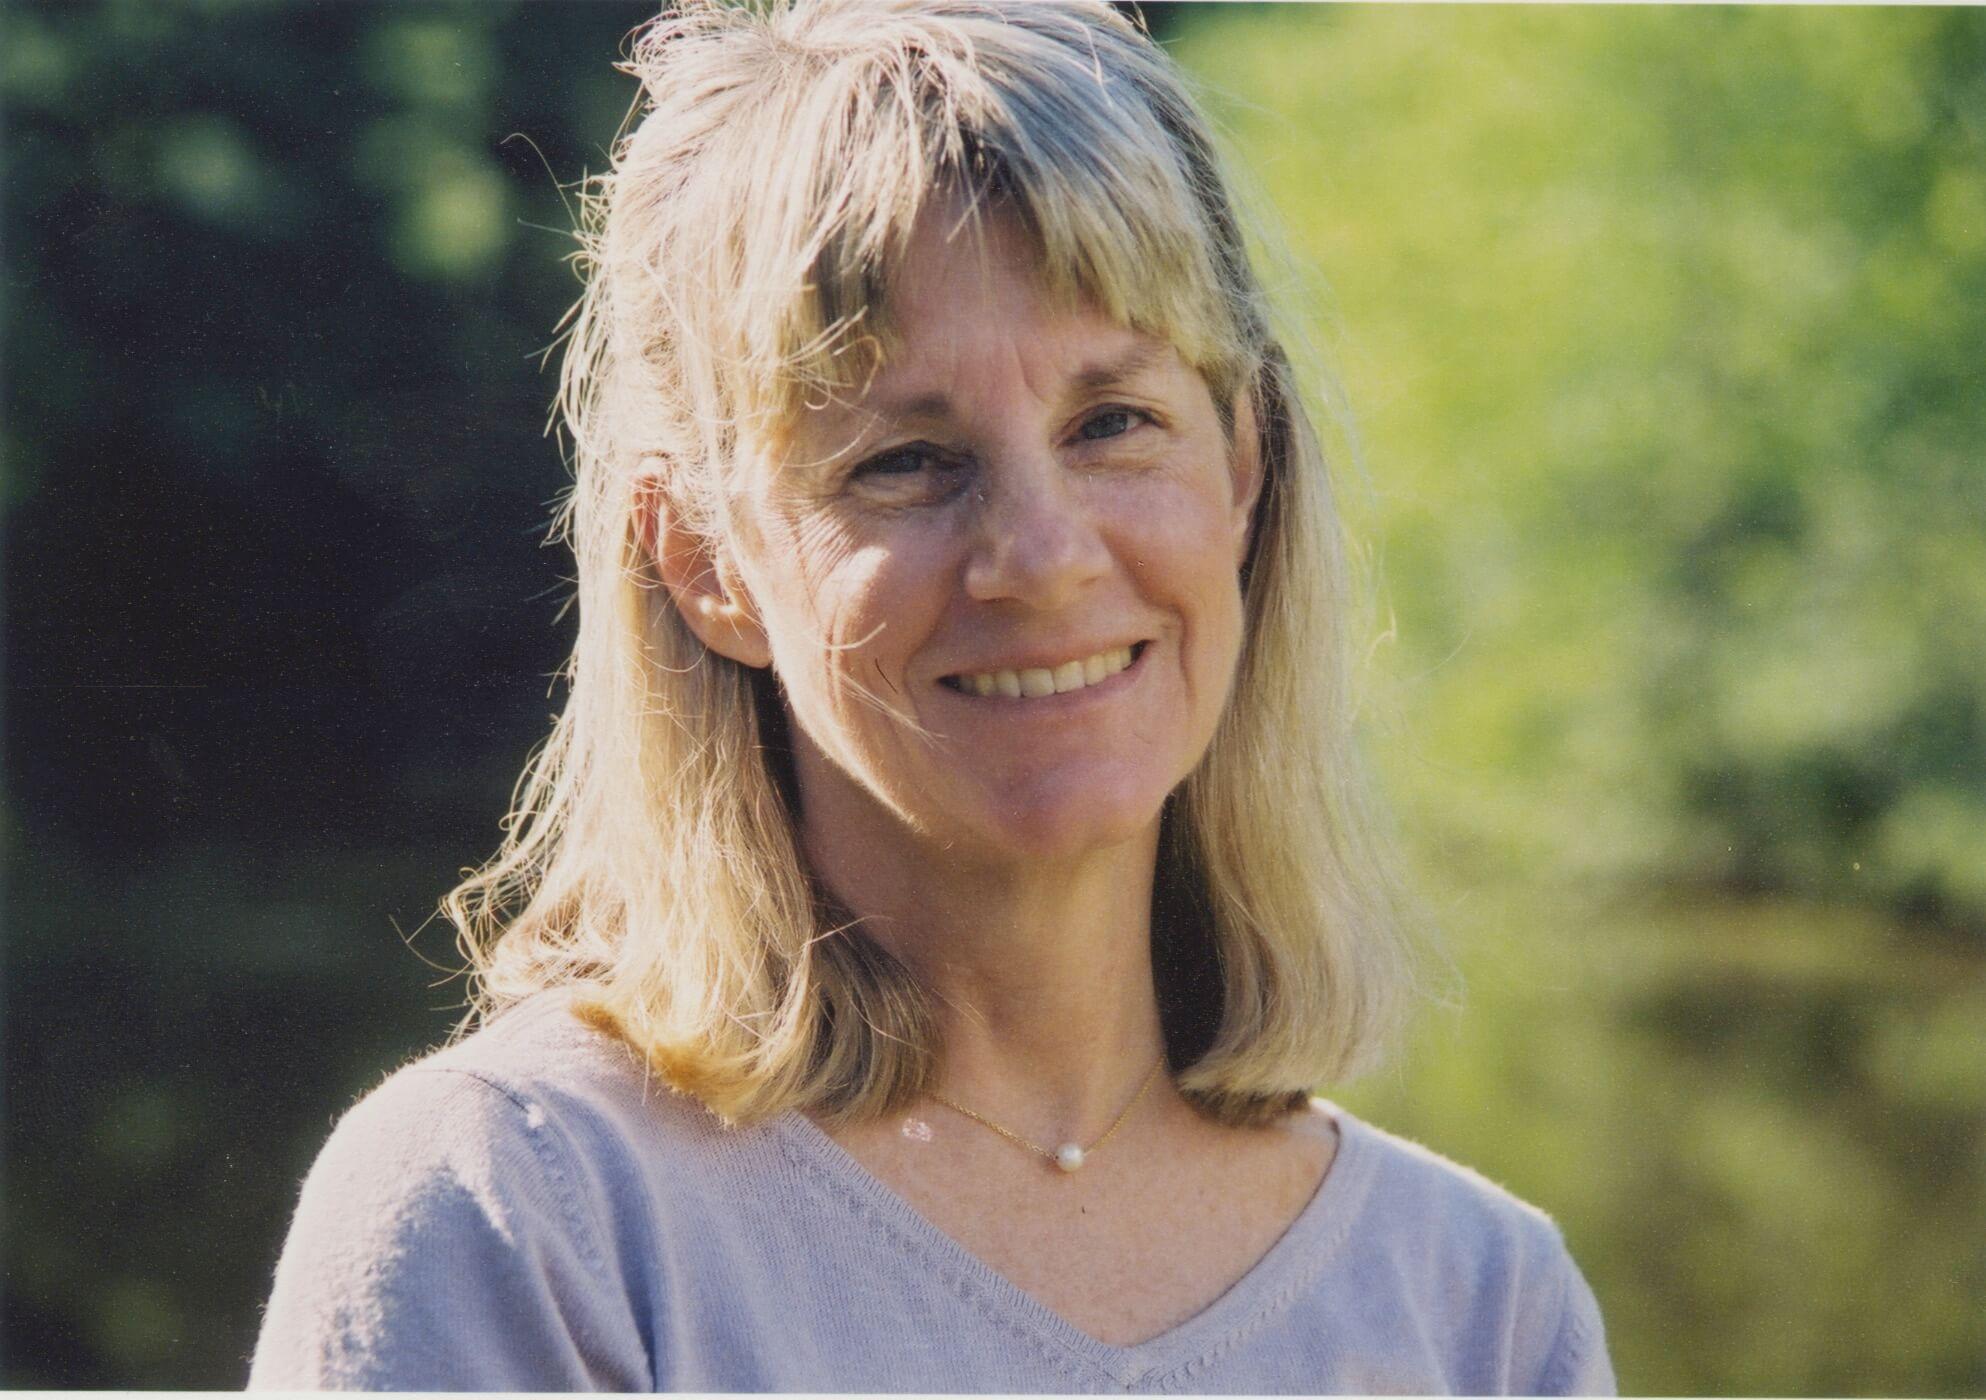 Carol Antoinette Peacock